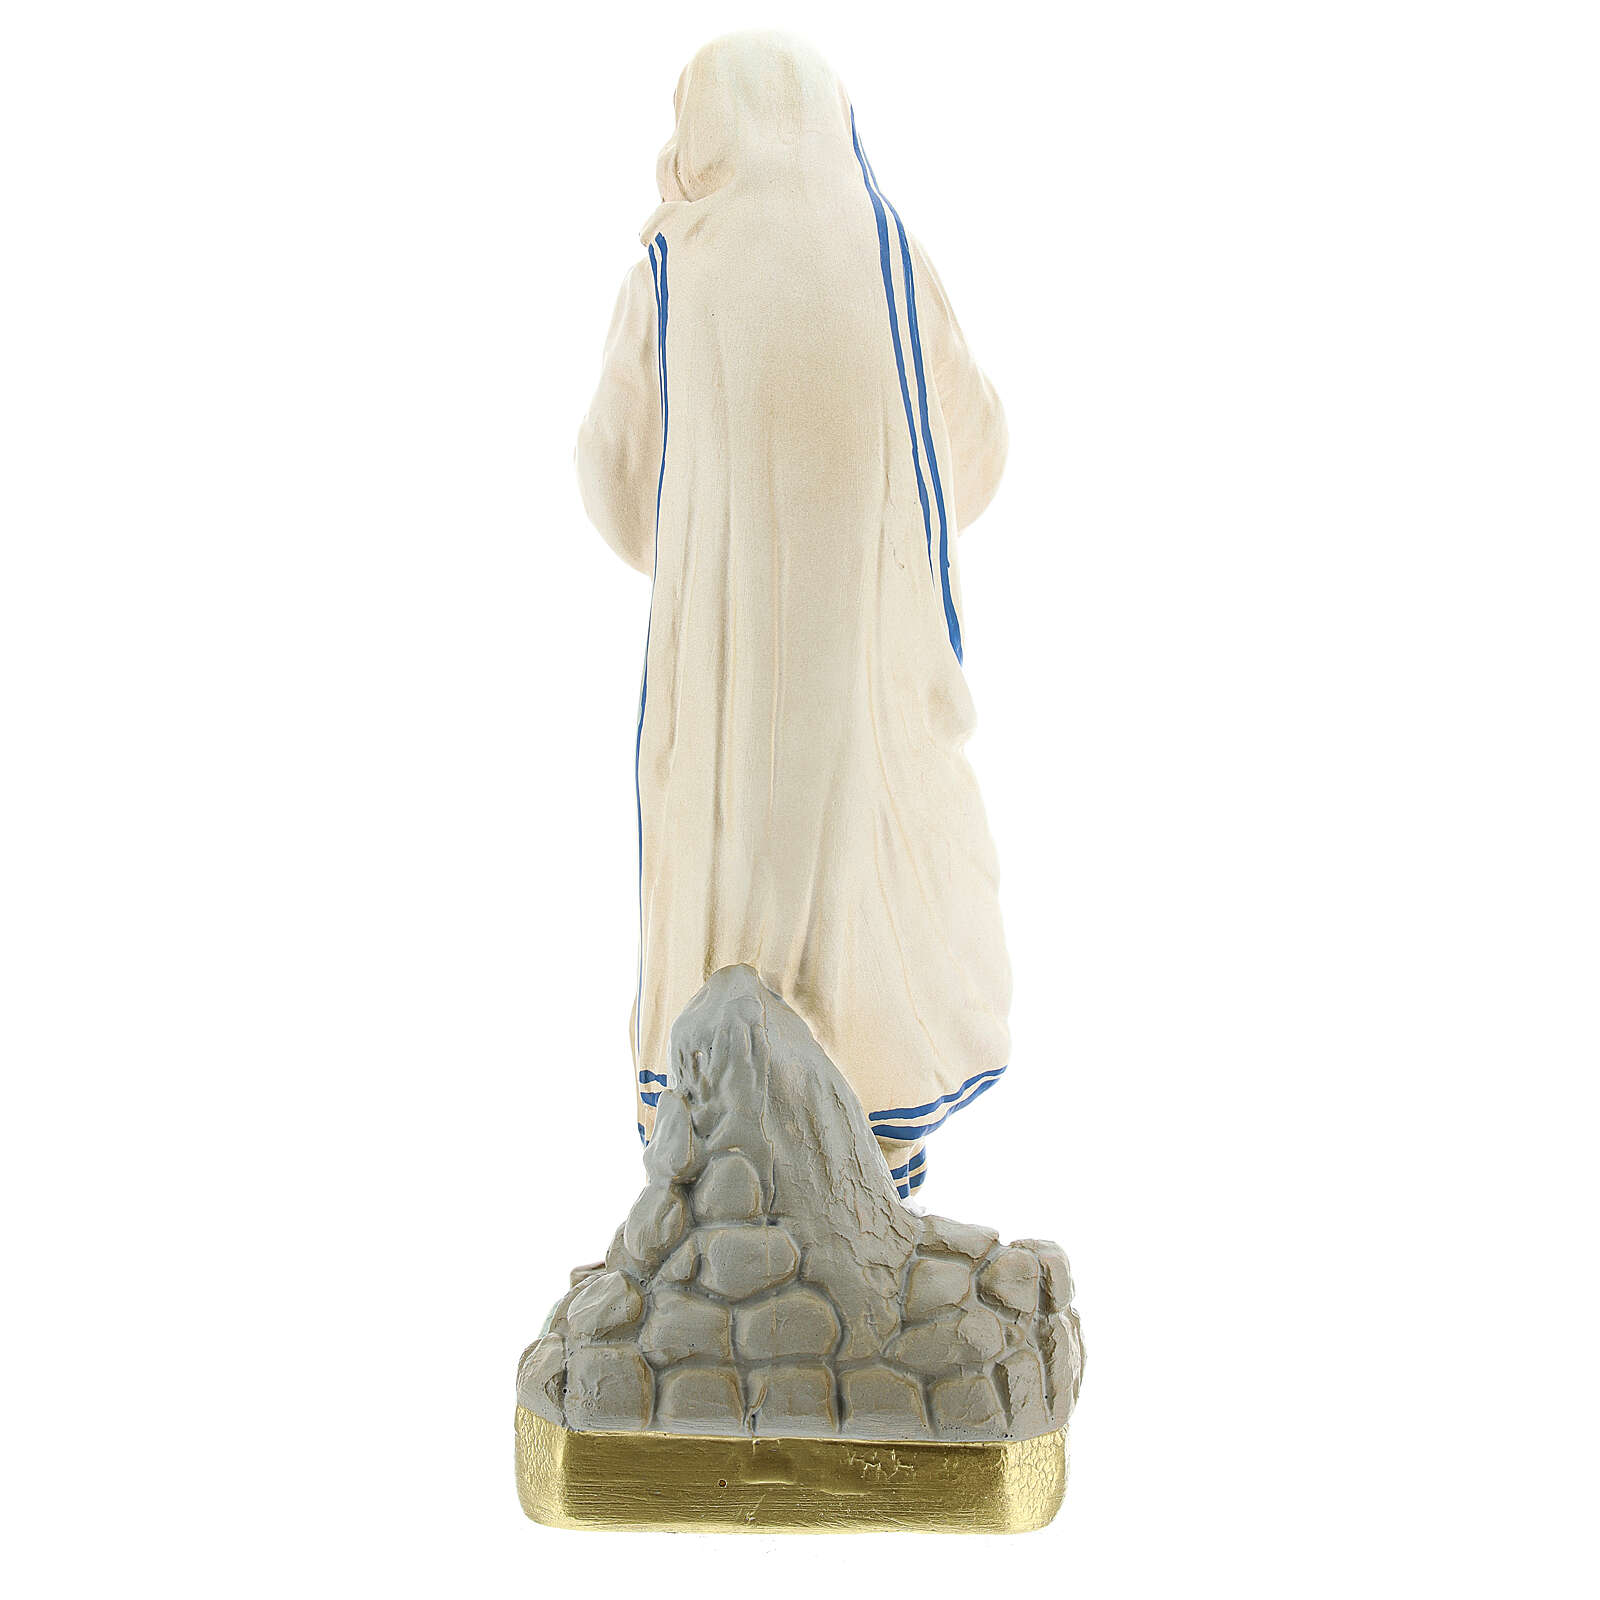 Madre Teresa de Calcuta estatua yeso 20 cm Arte Barsanti 4